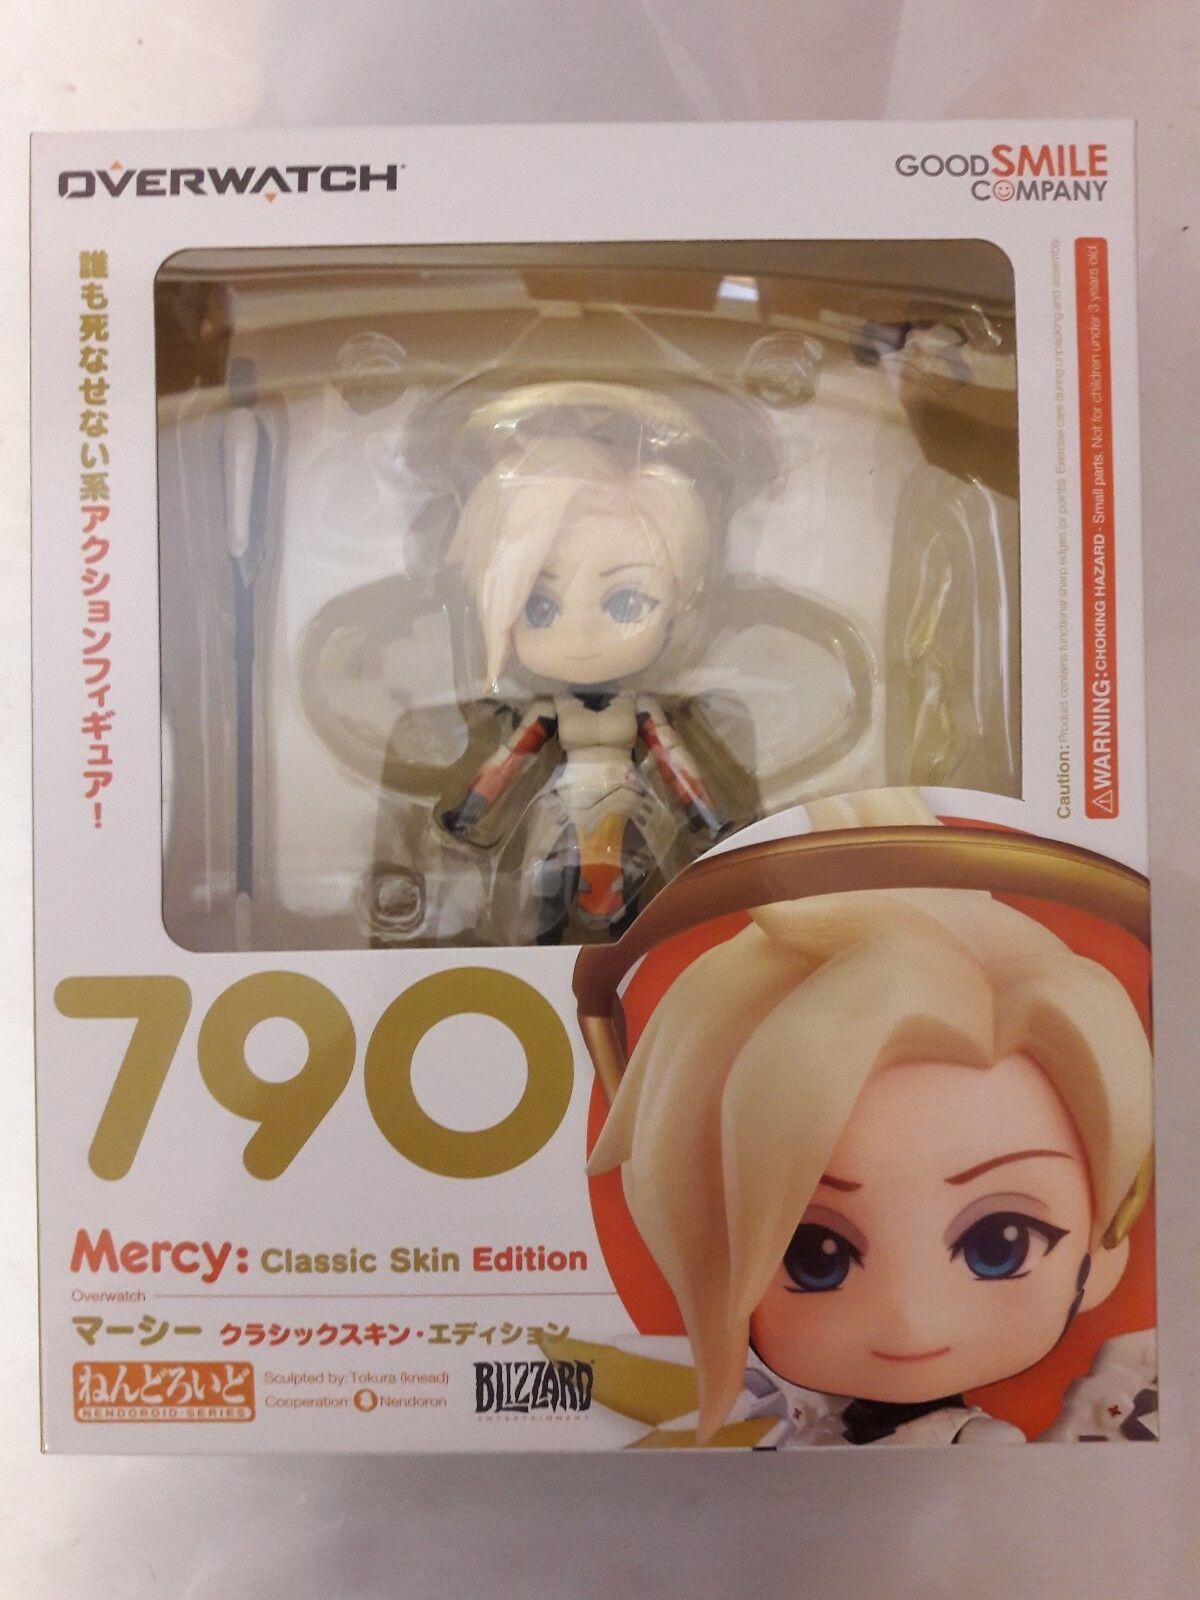 Good Smile Overwatch Overwatch Overwatch Mercy Classic Skin Edition (BRAND NEW) - genuine goodsmile b18a43